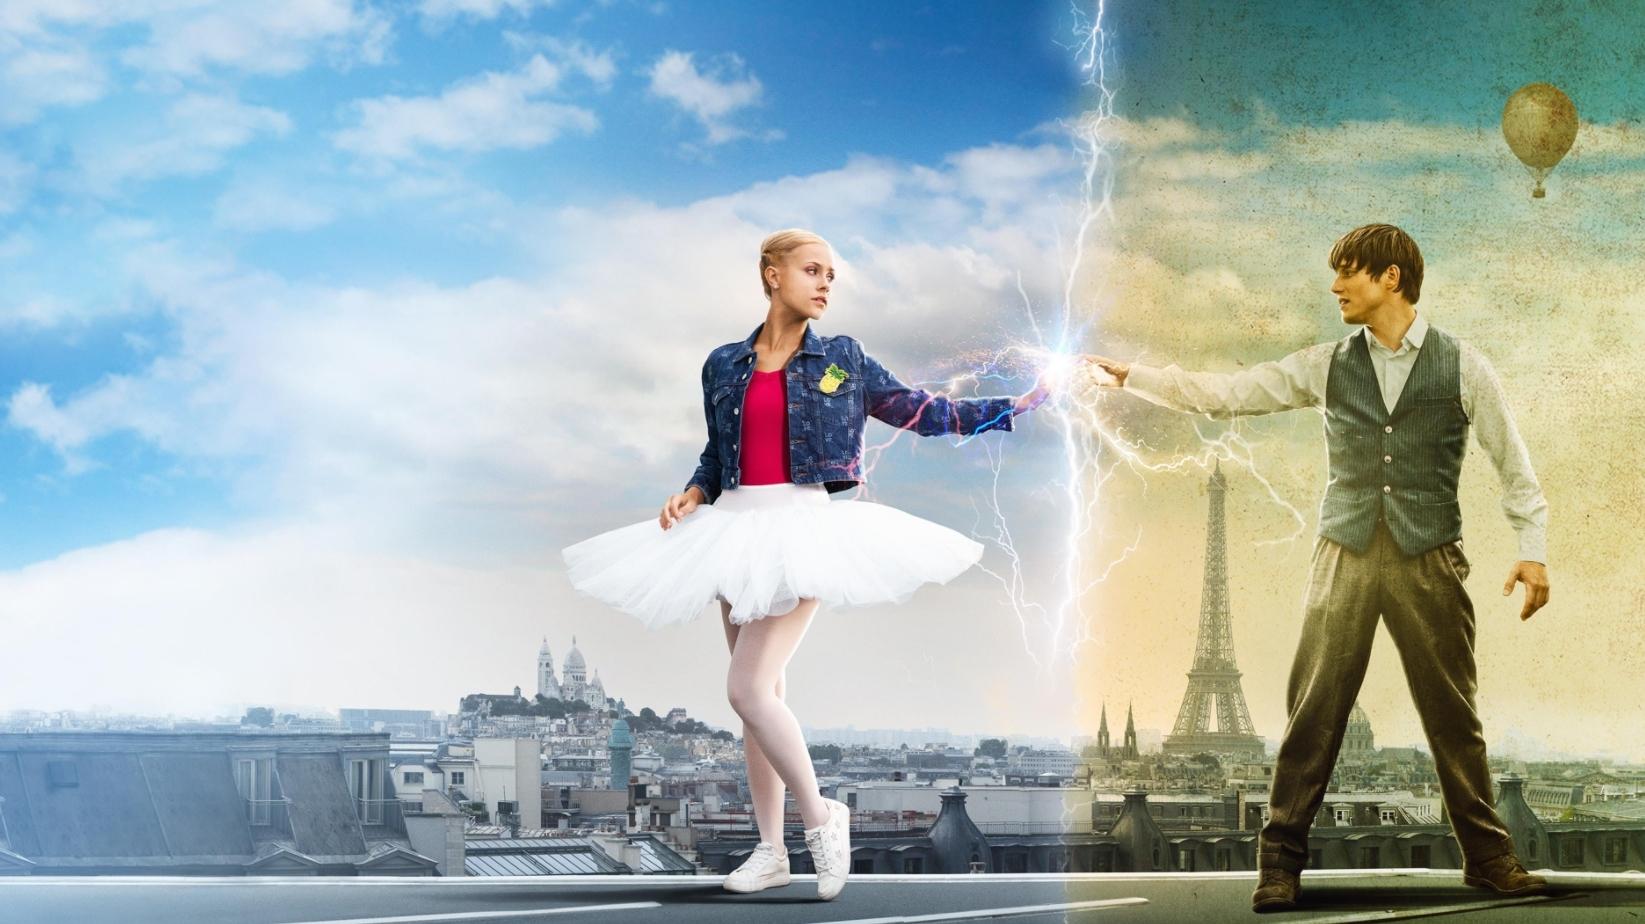 Ne Vedem La Paris (Find Me in Paris) Sezonul 2 Episodul 10 Online Dublat In Romana